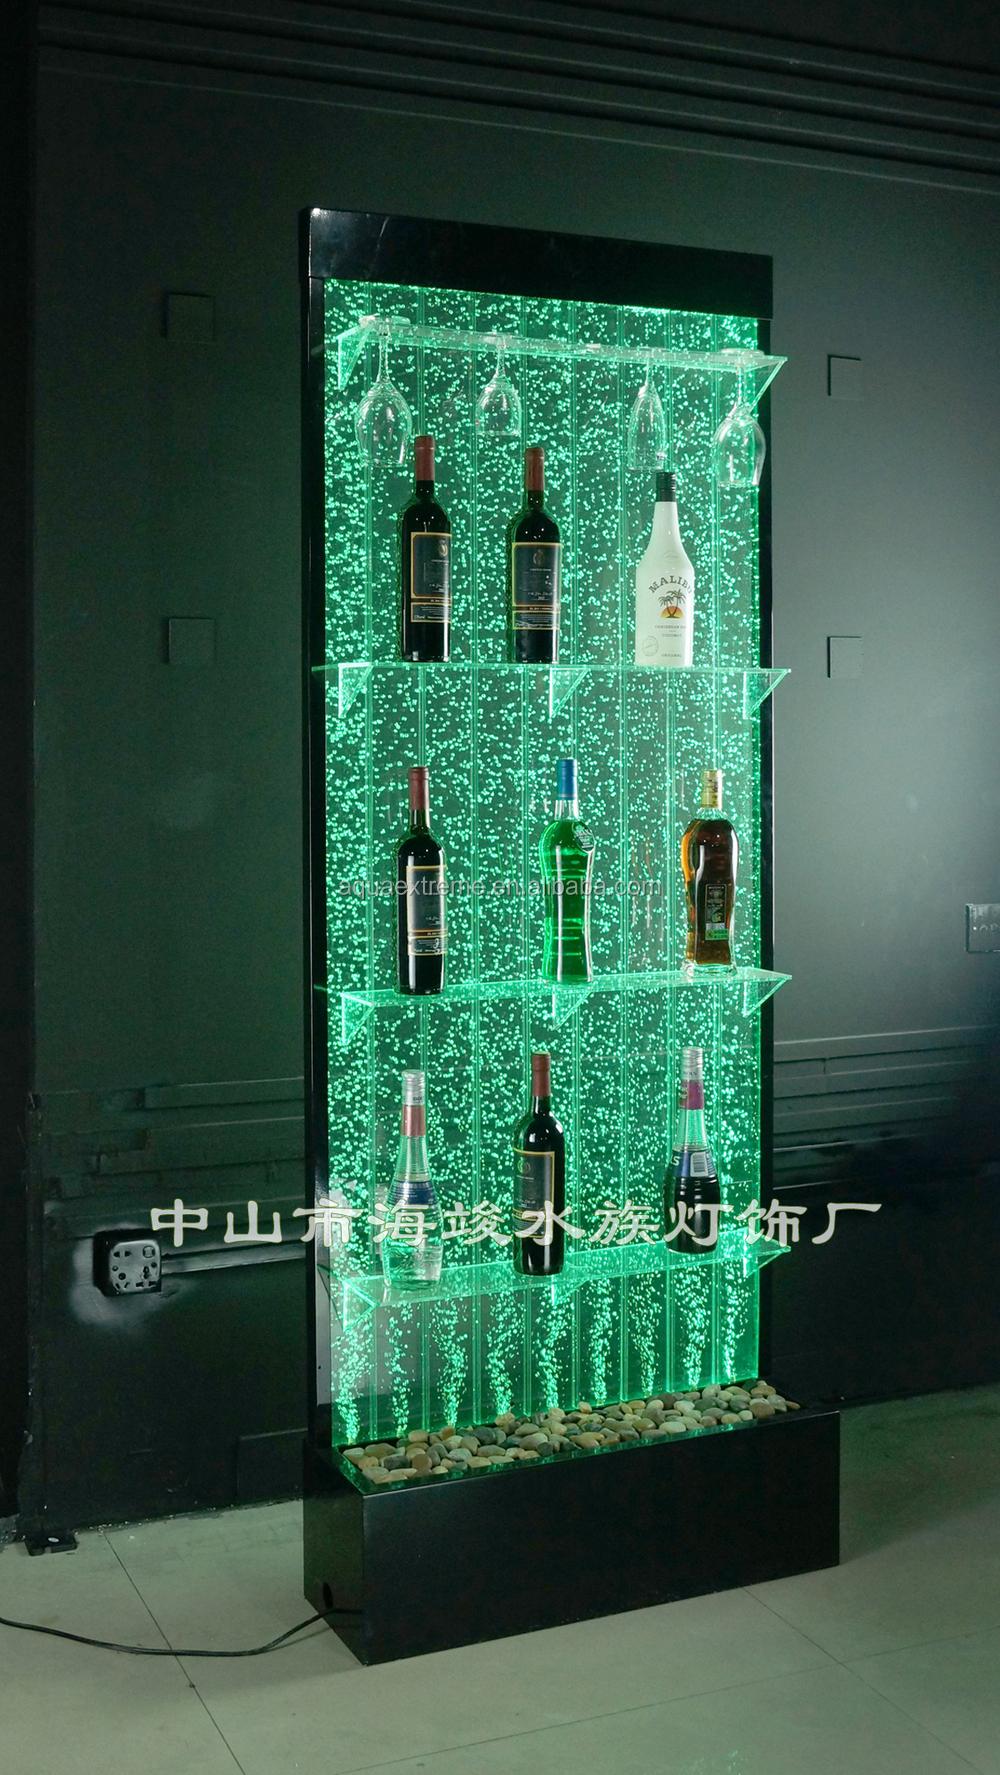 wine rack lighting. Led Lighting Bubble Water Liquor Display Rack,with Color Changing,Amazing Wine Rack